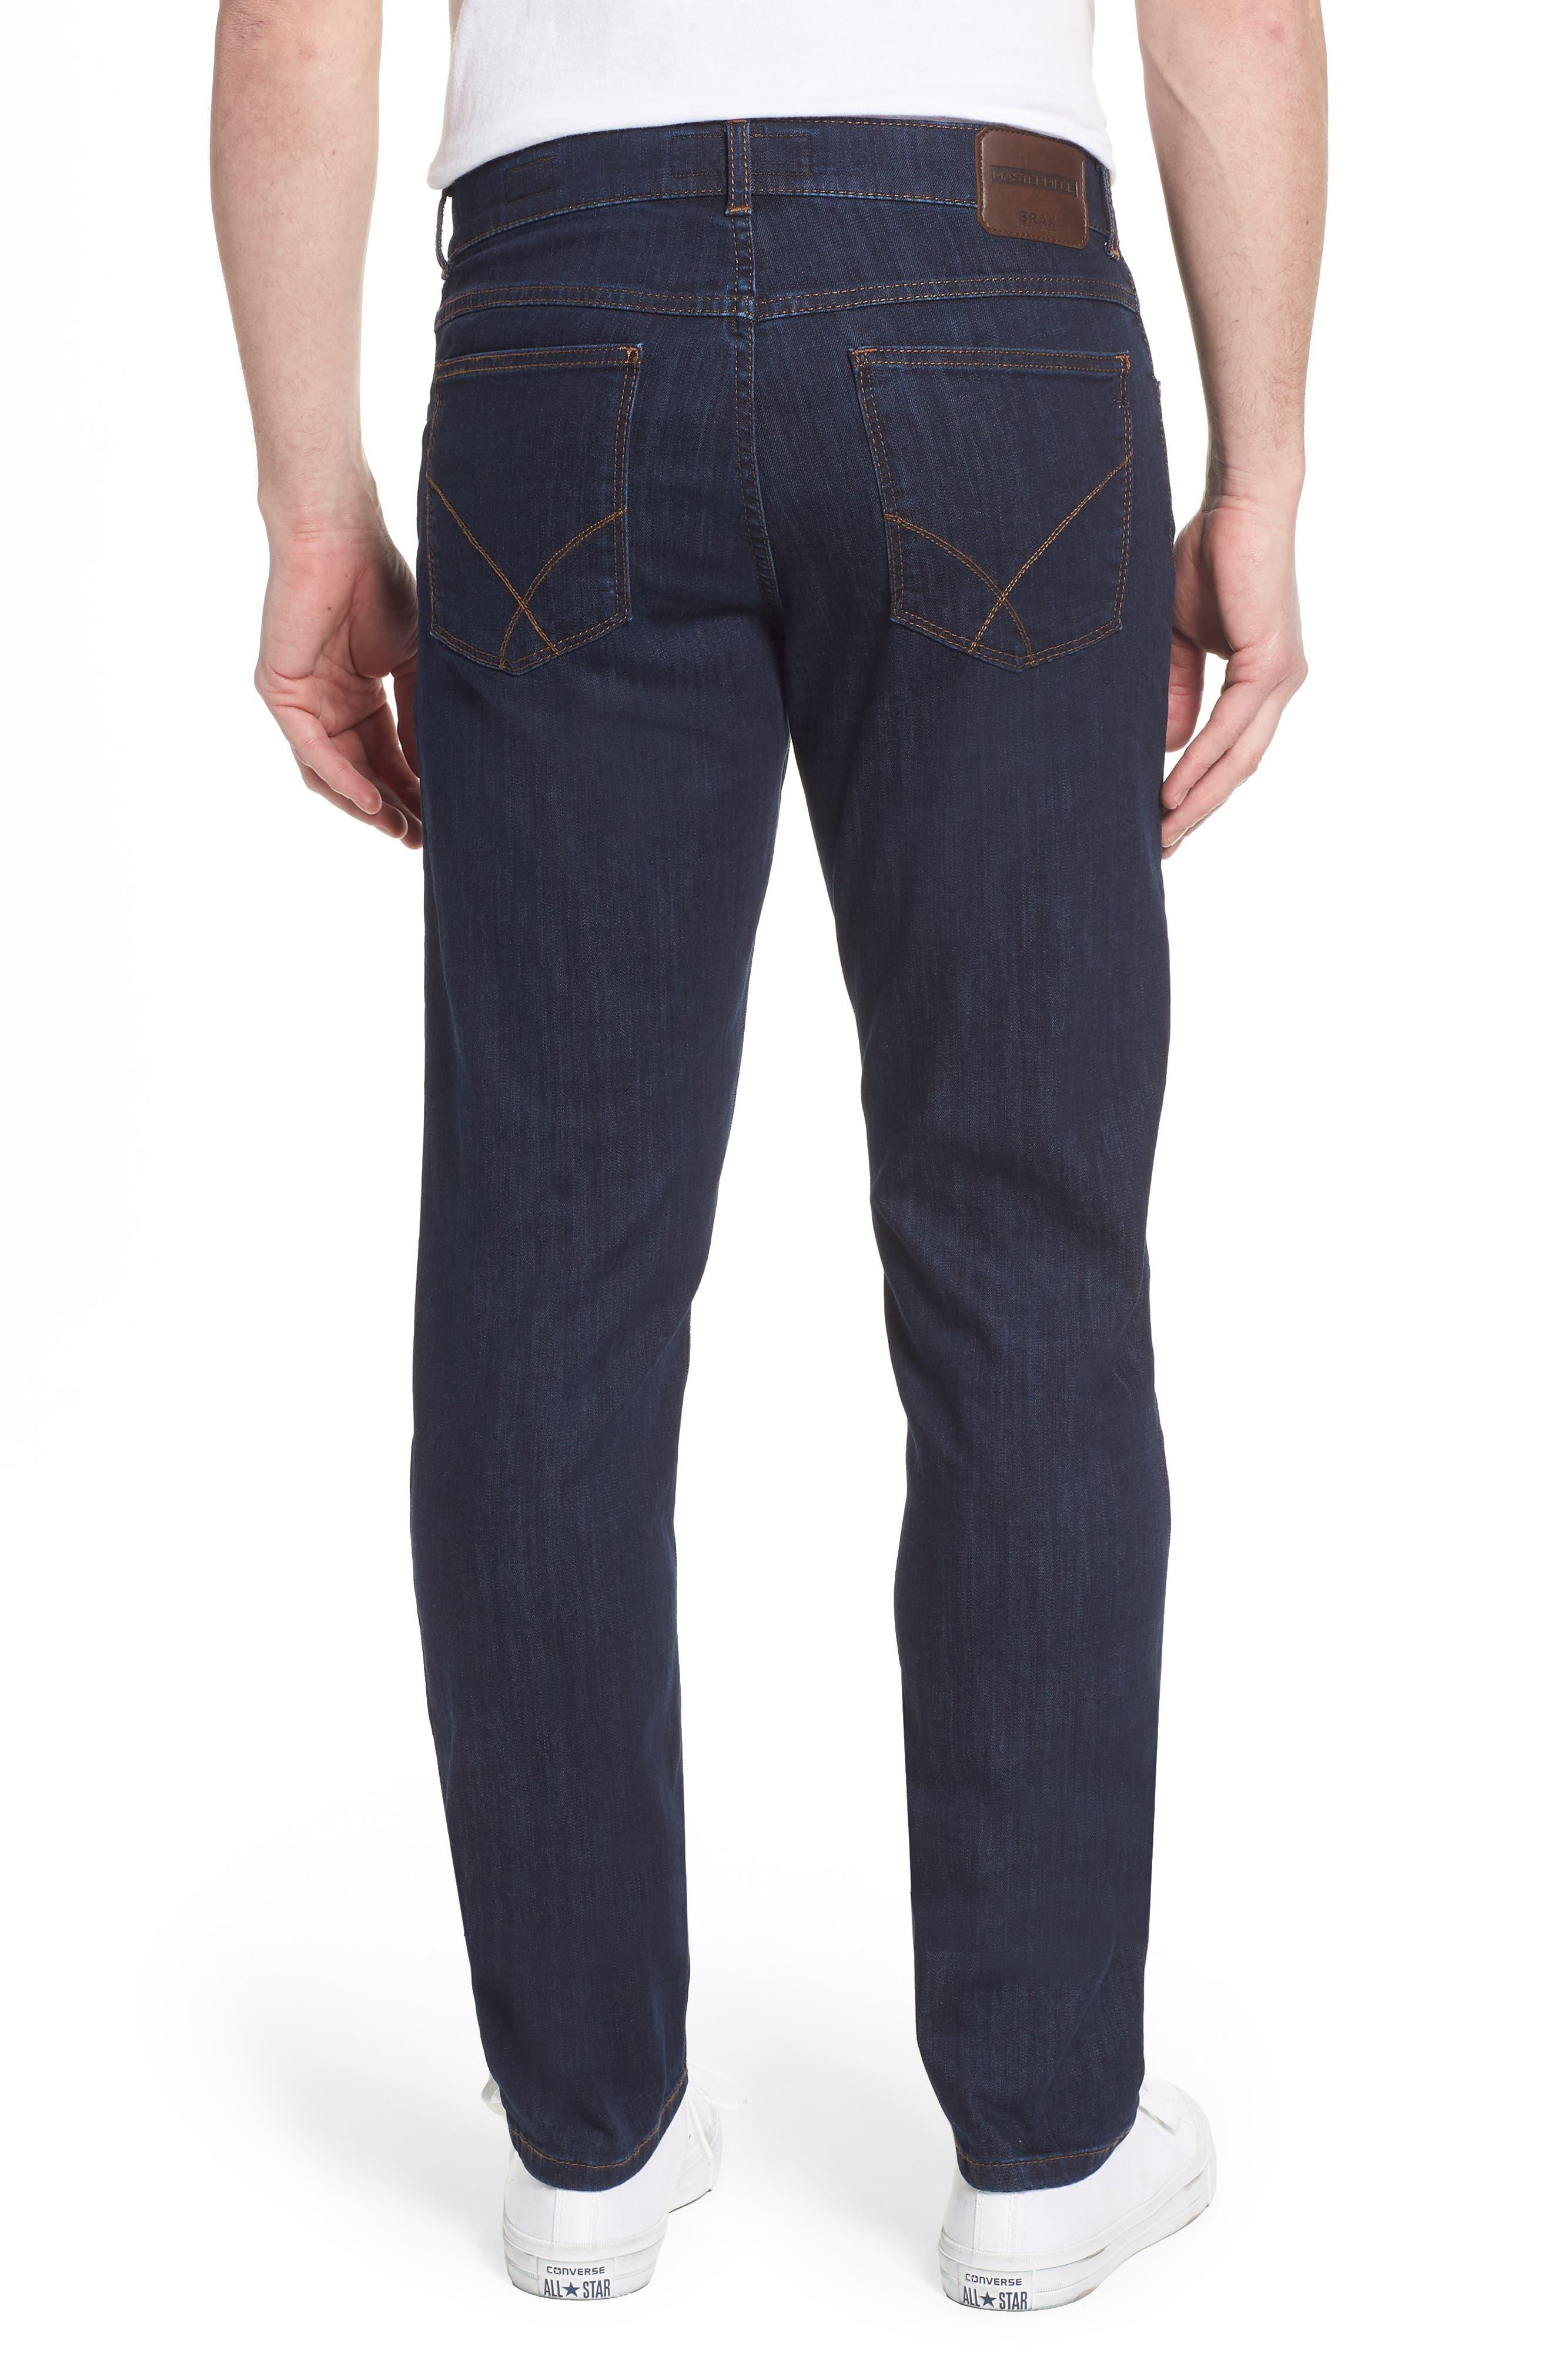 Masterpiece Regular Jeans,                             Alternate thumbnail 5, color,